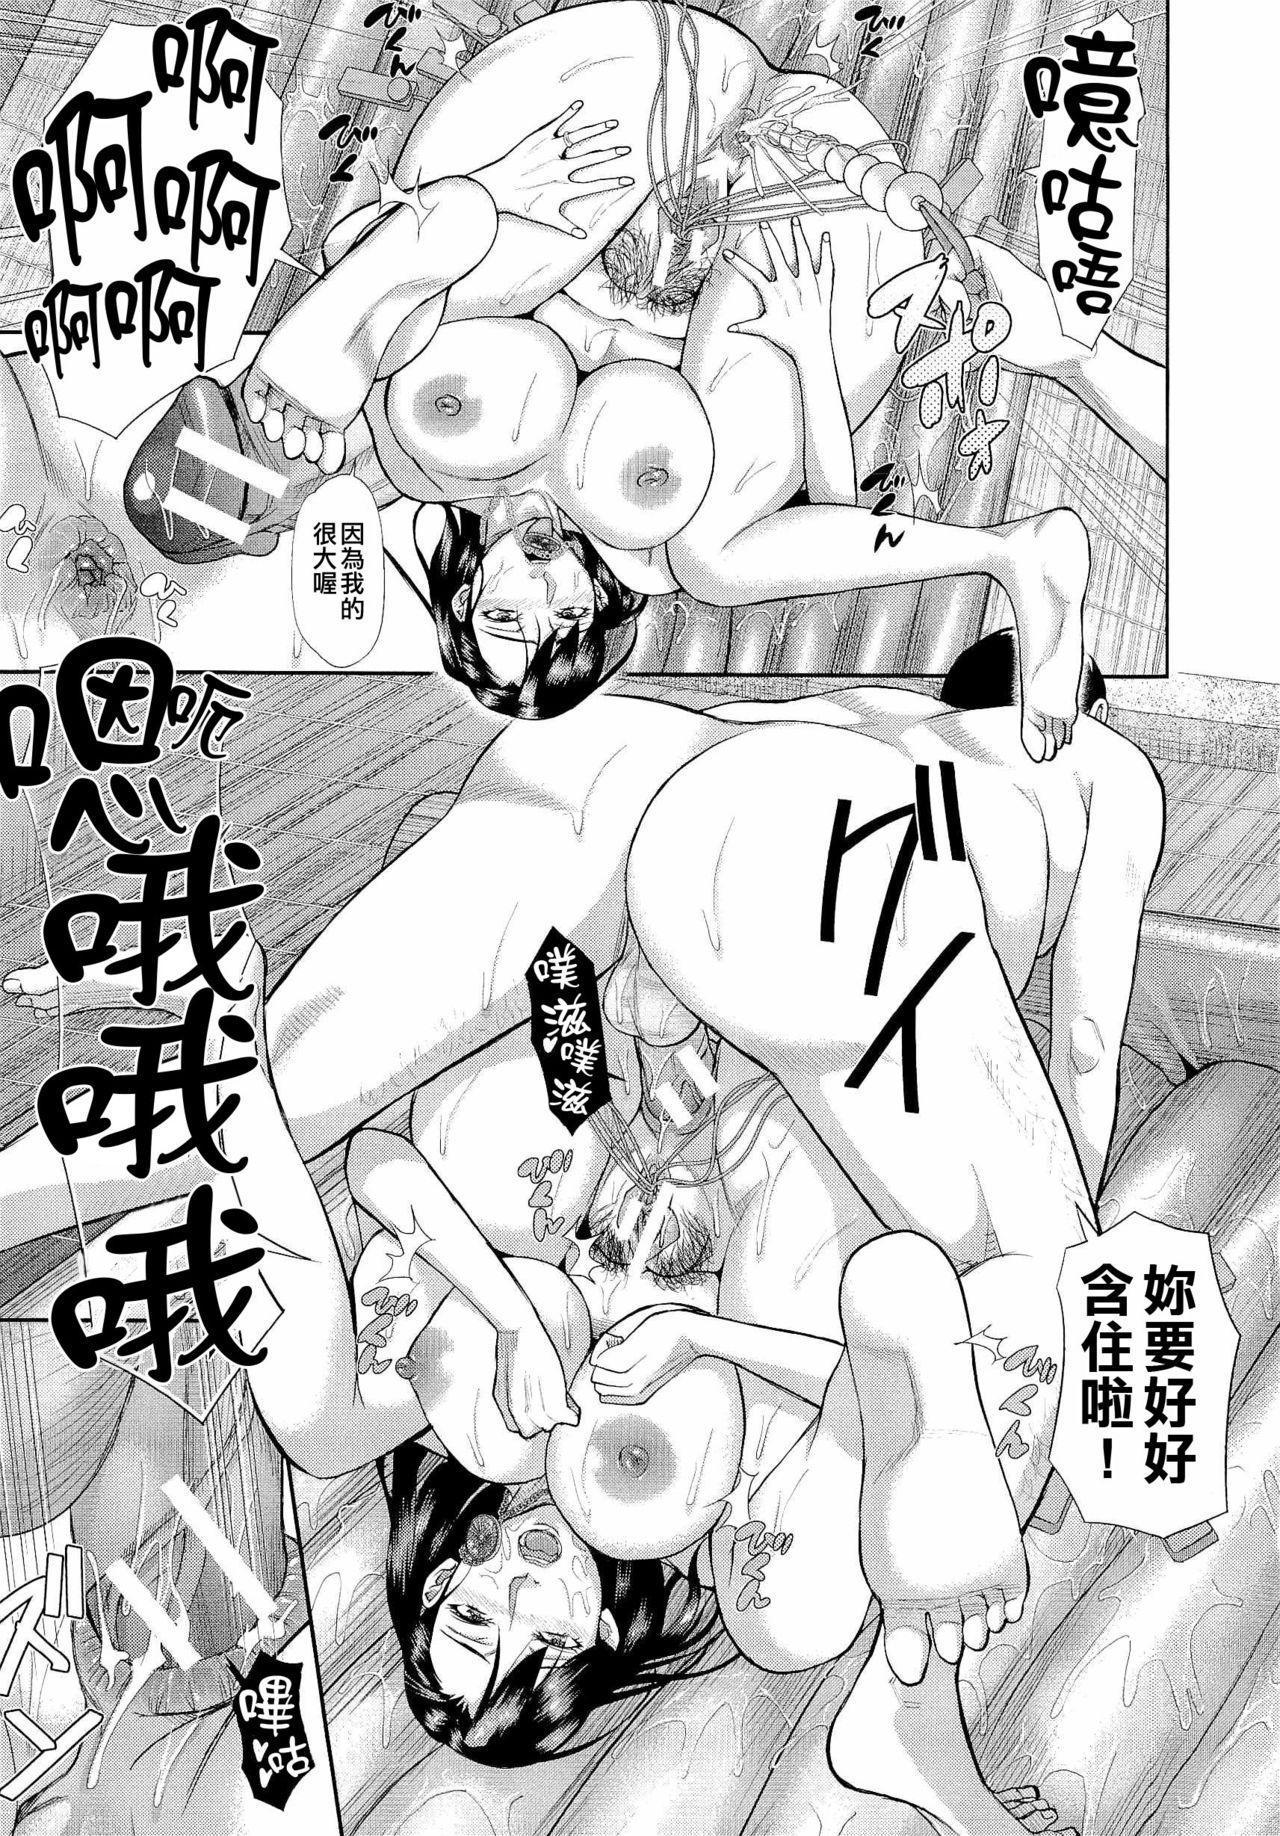 [Honebuto Danshaku] Innou Kaizou Program ~Oyako Zecchou Cult Ochi~ [Chinese]【不想记名重嵌--高质量图源】 26